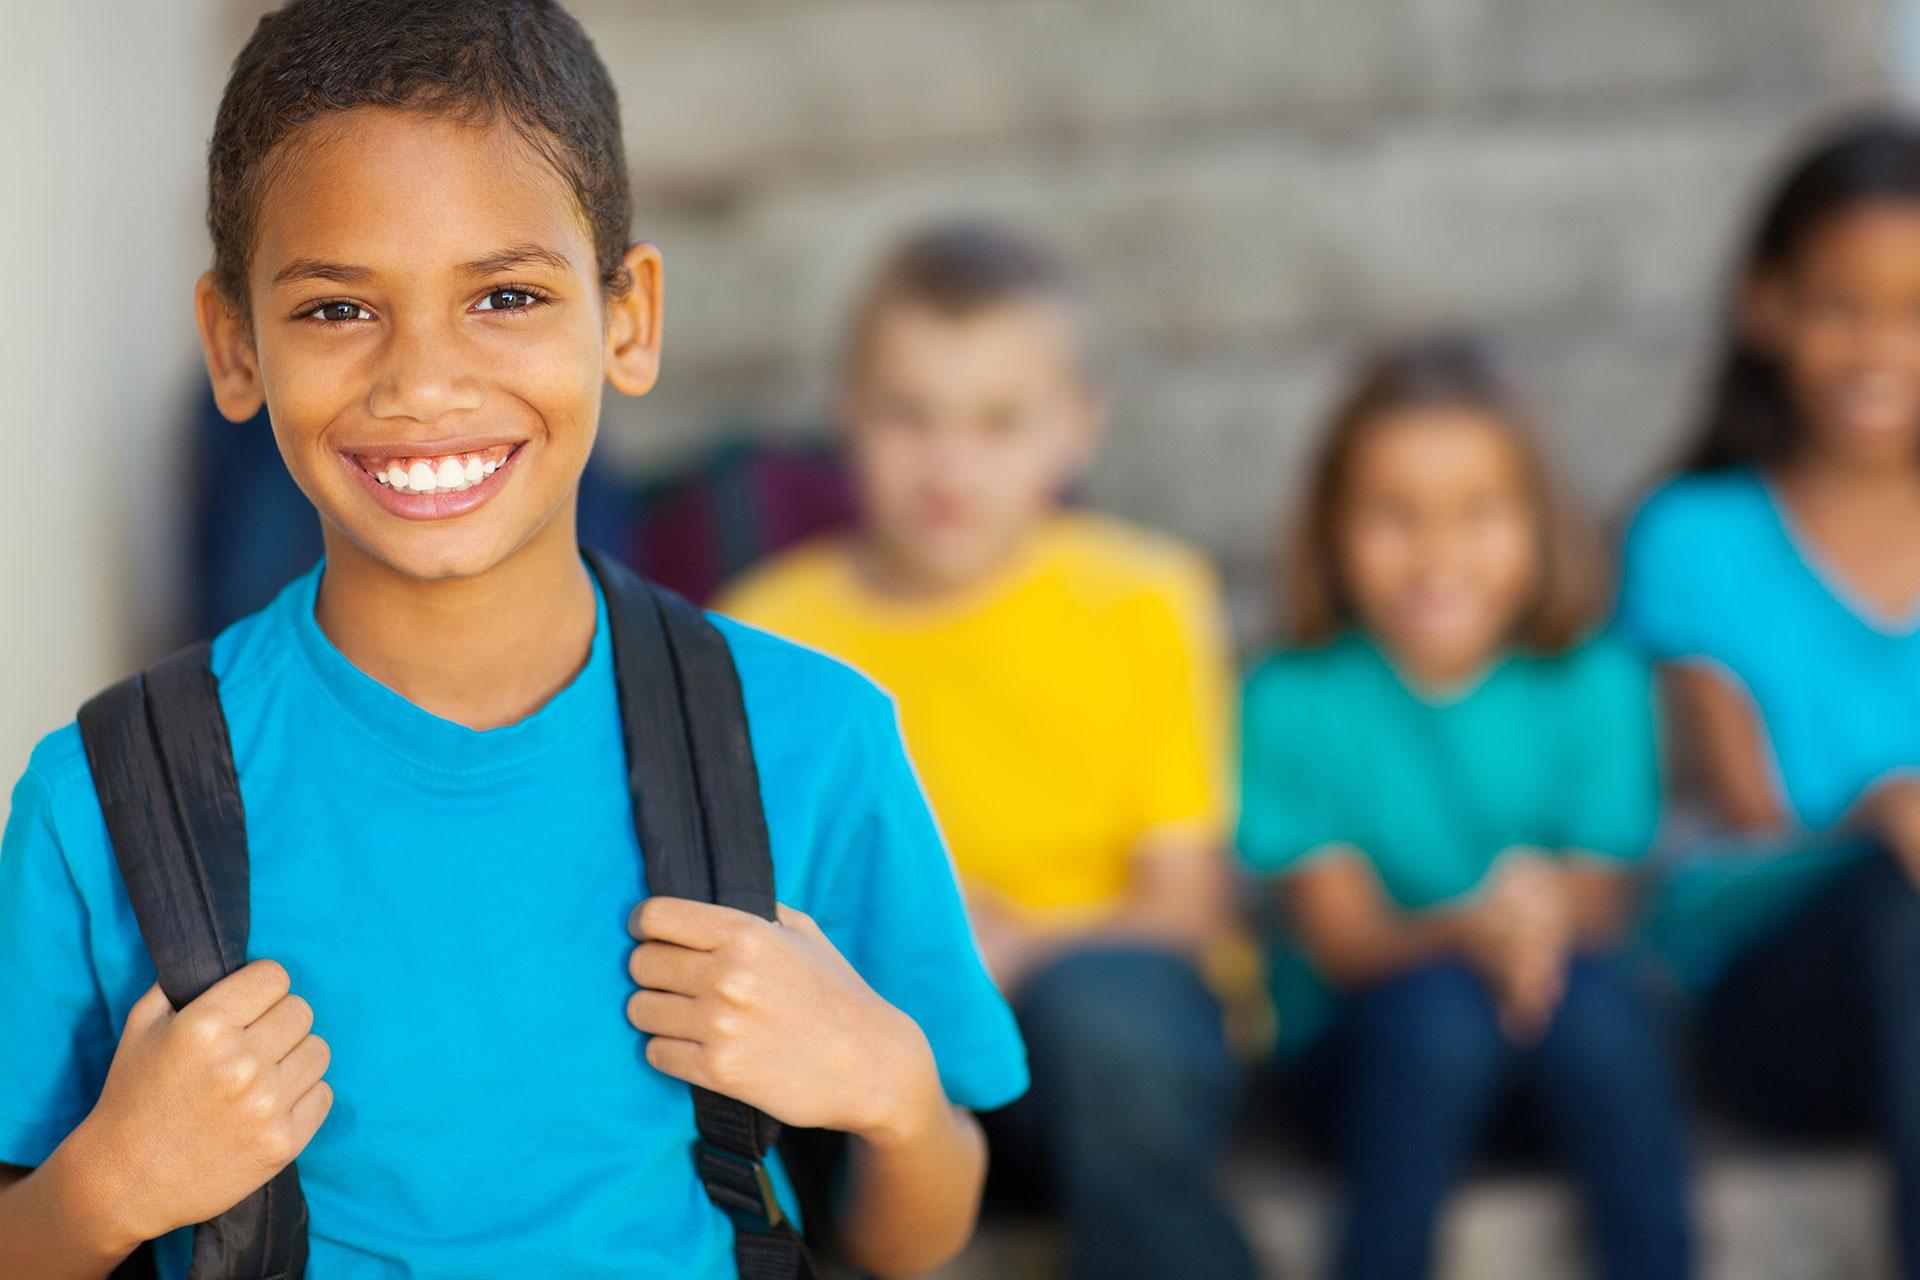 Apopka Pre-kindergarten Children at ACA